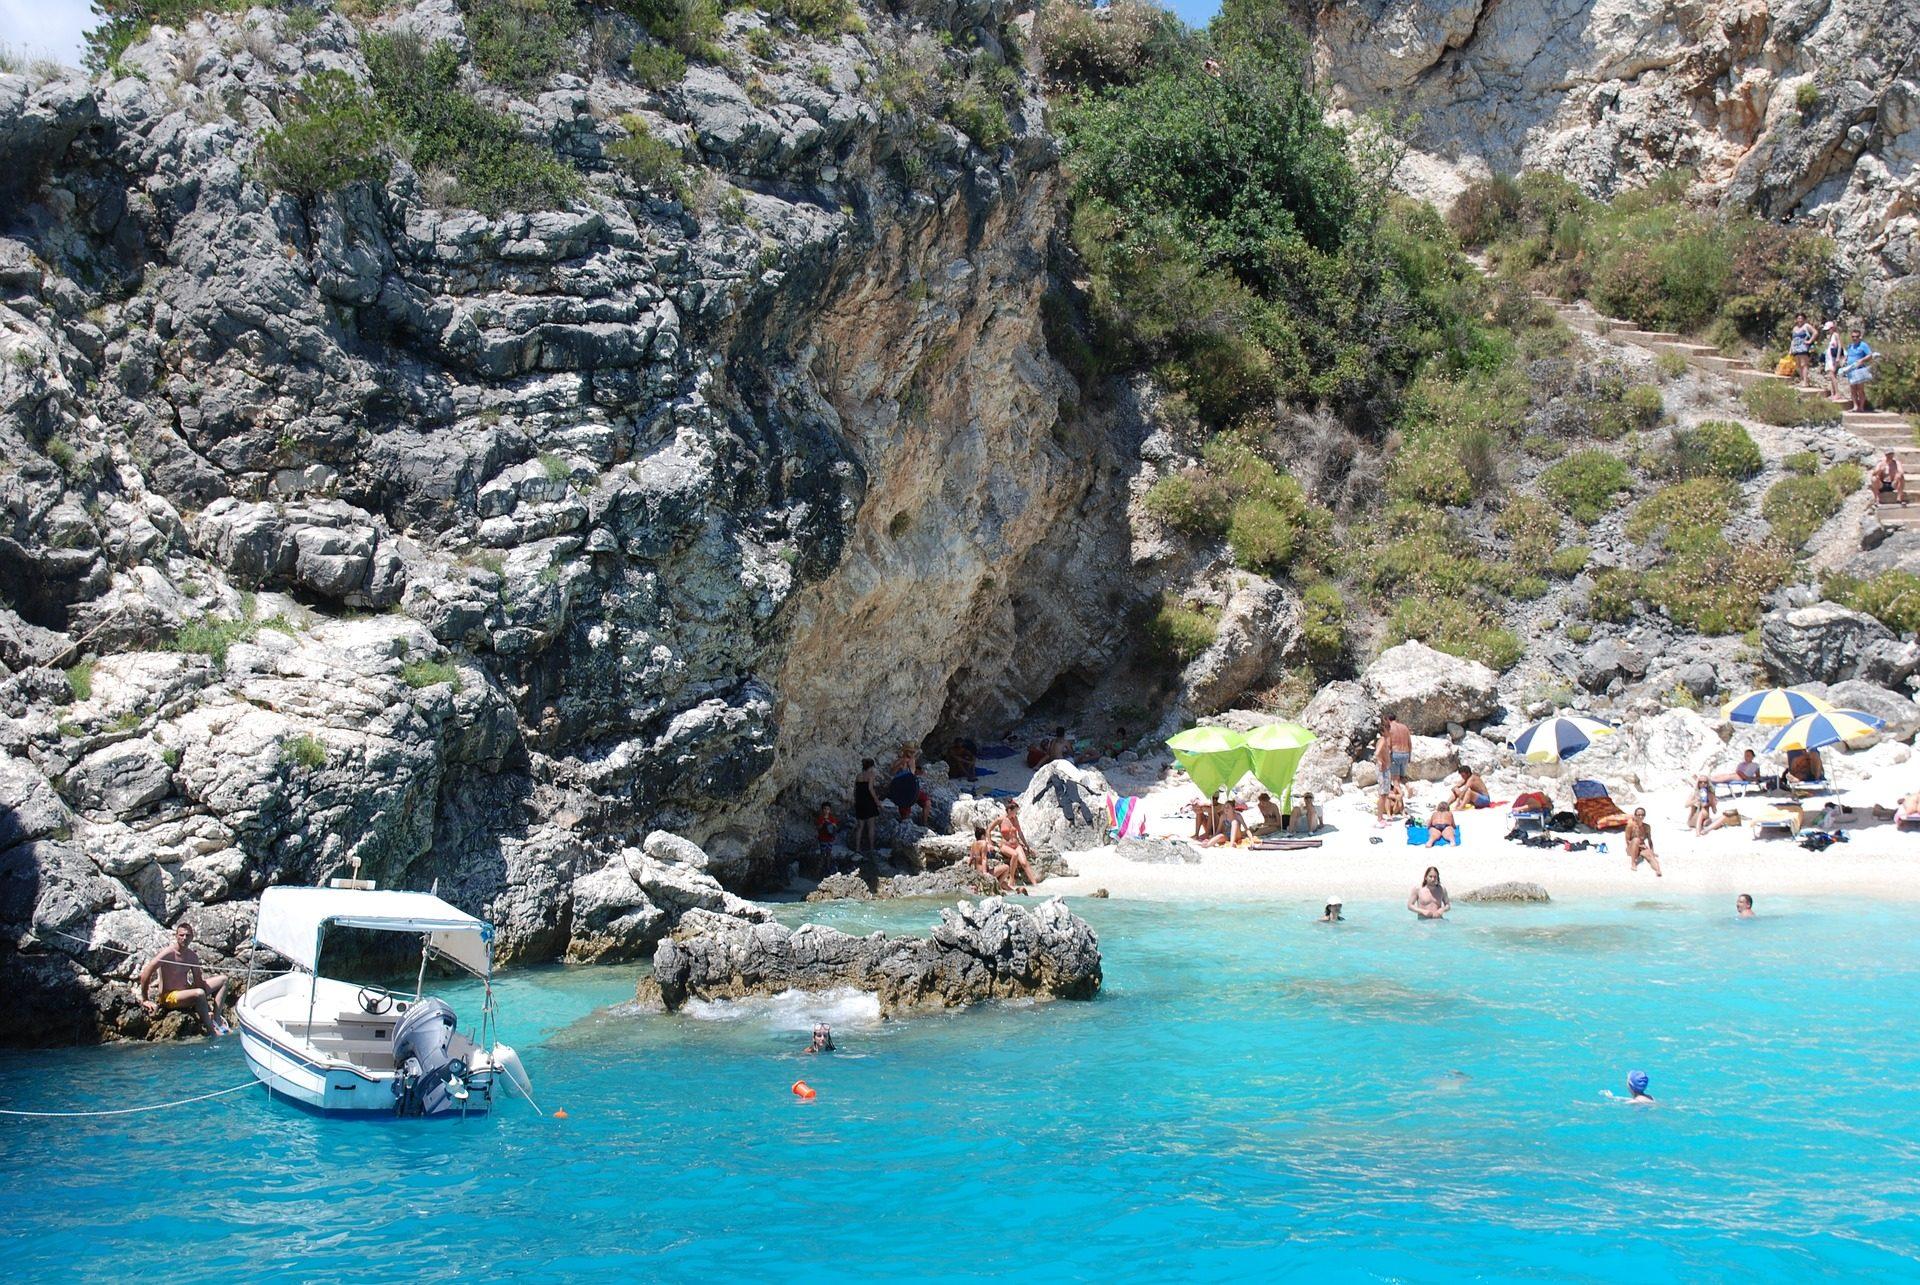 Strand, Costa, Steinen, Cliff, Tourismus, Türkis, agiofili, Griechenland - Wallpaper HD - Prof.-falken.com